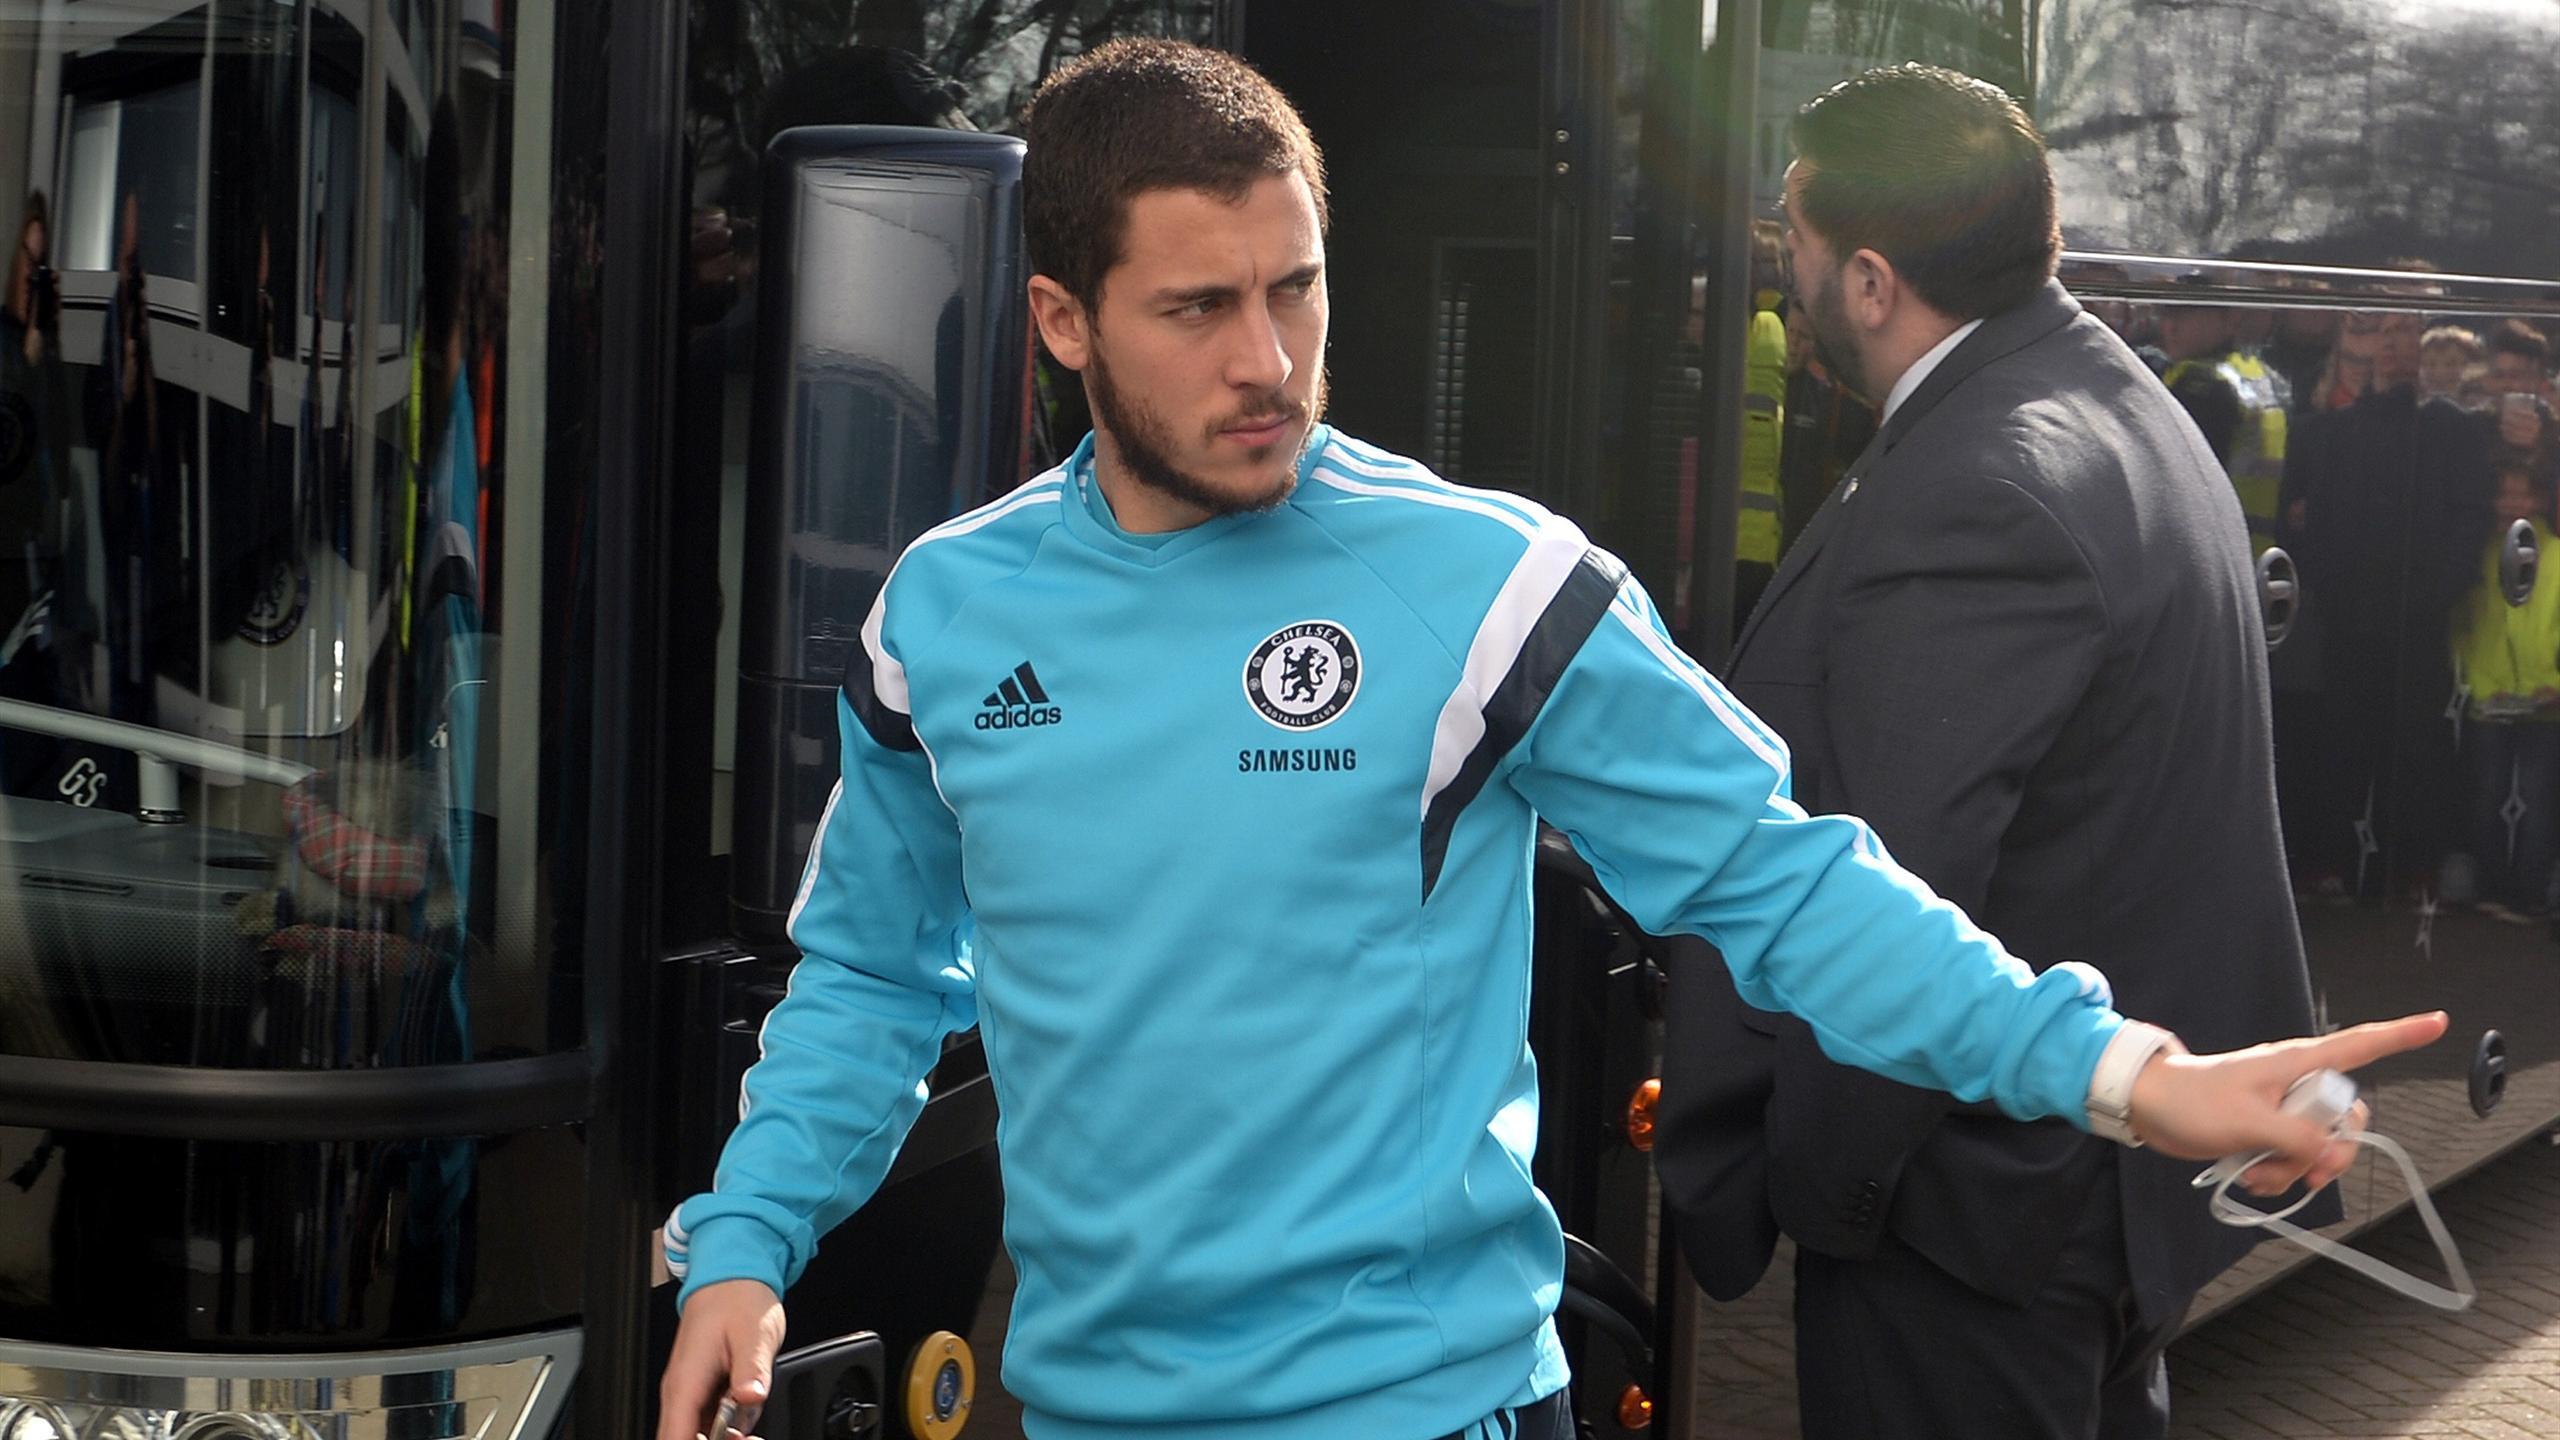 Eden Hazard gets off the bus for Chelsea